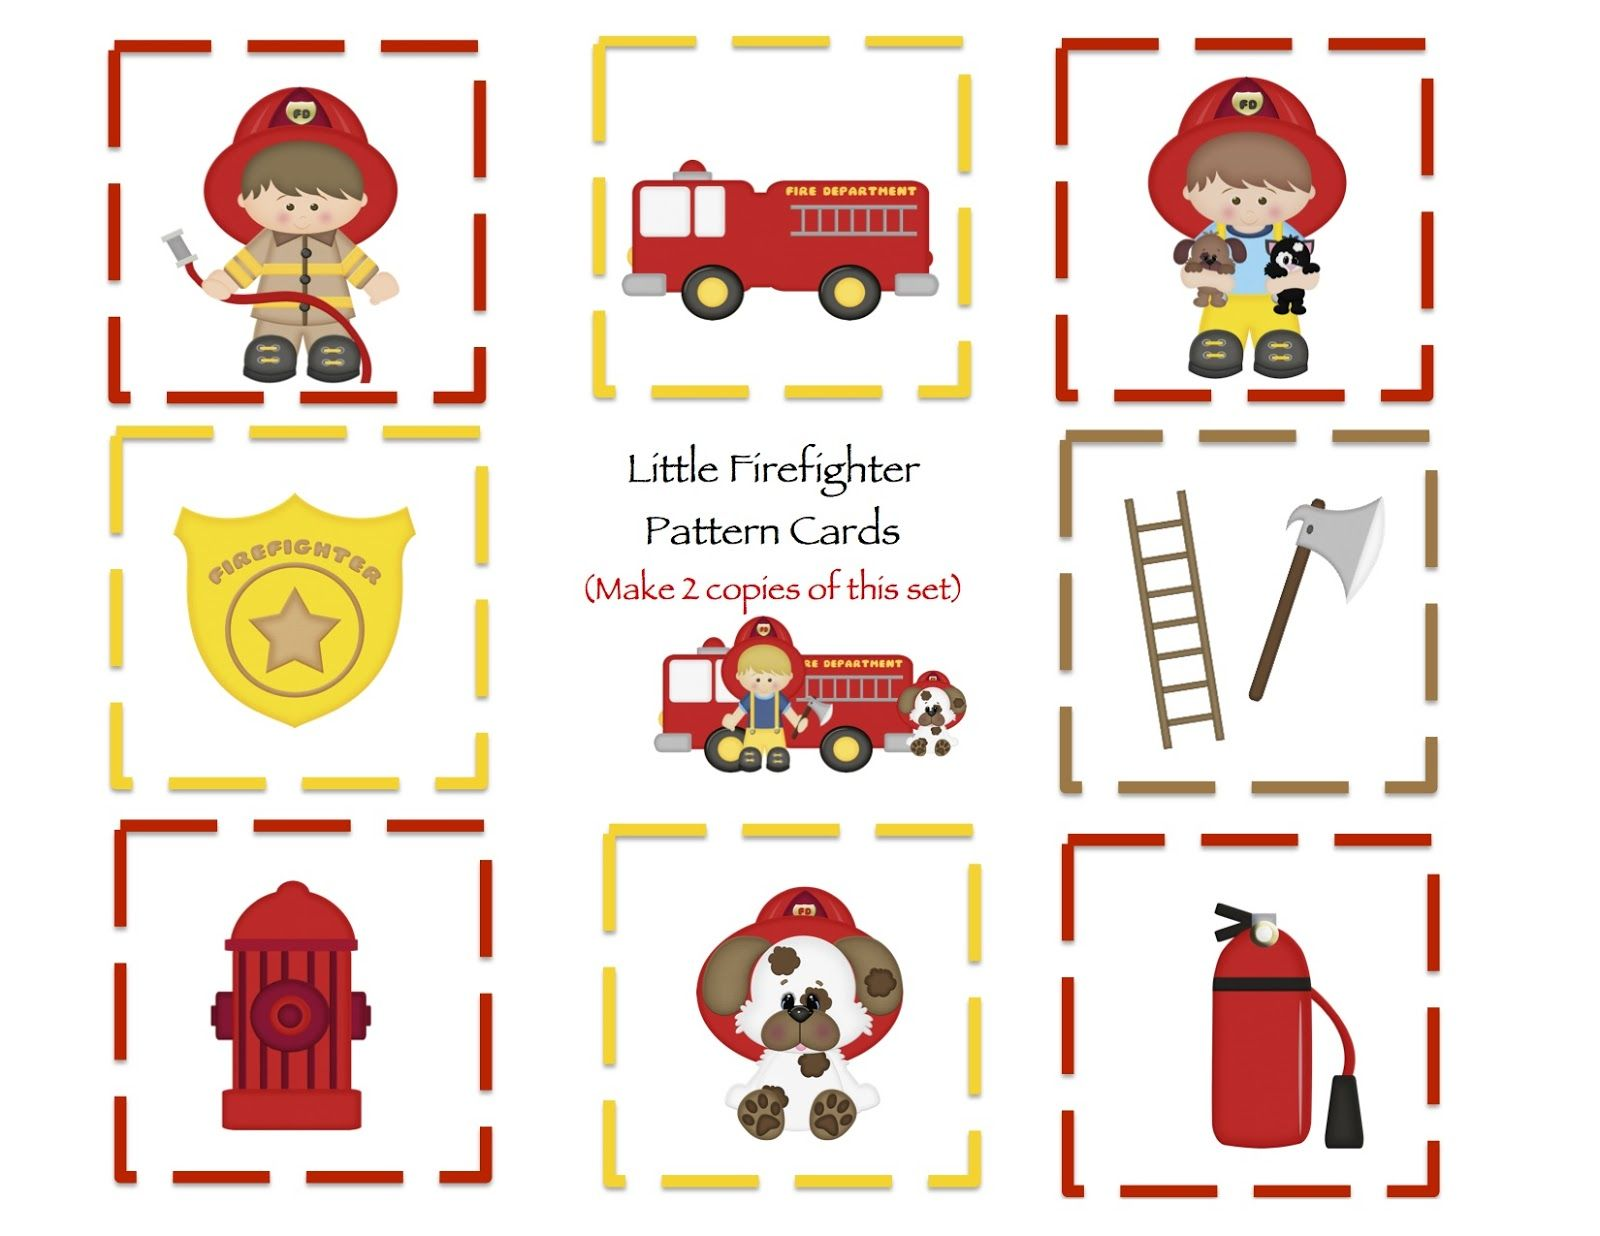 preschool fire safety crafts preschool printables safety safety 844